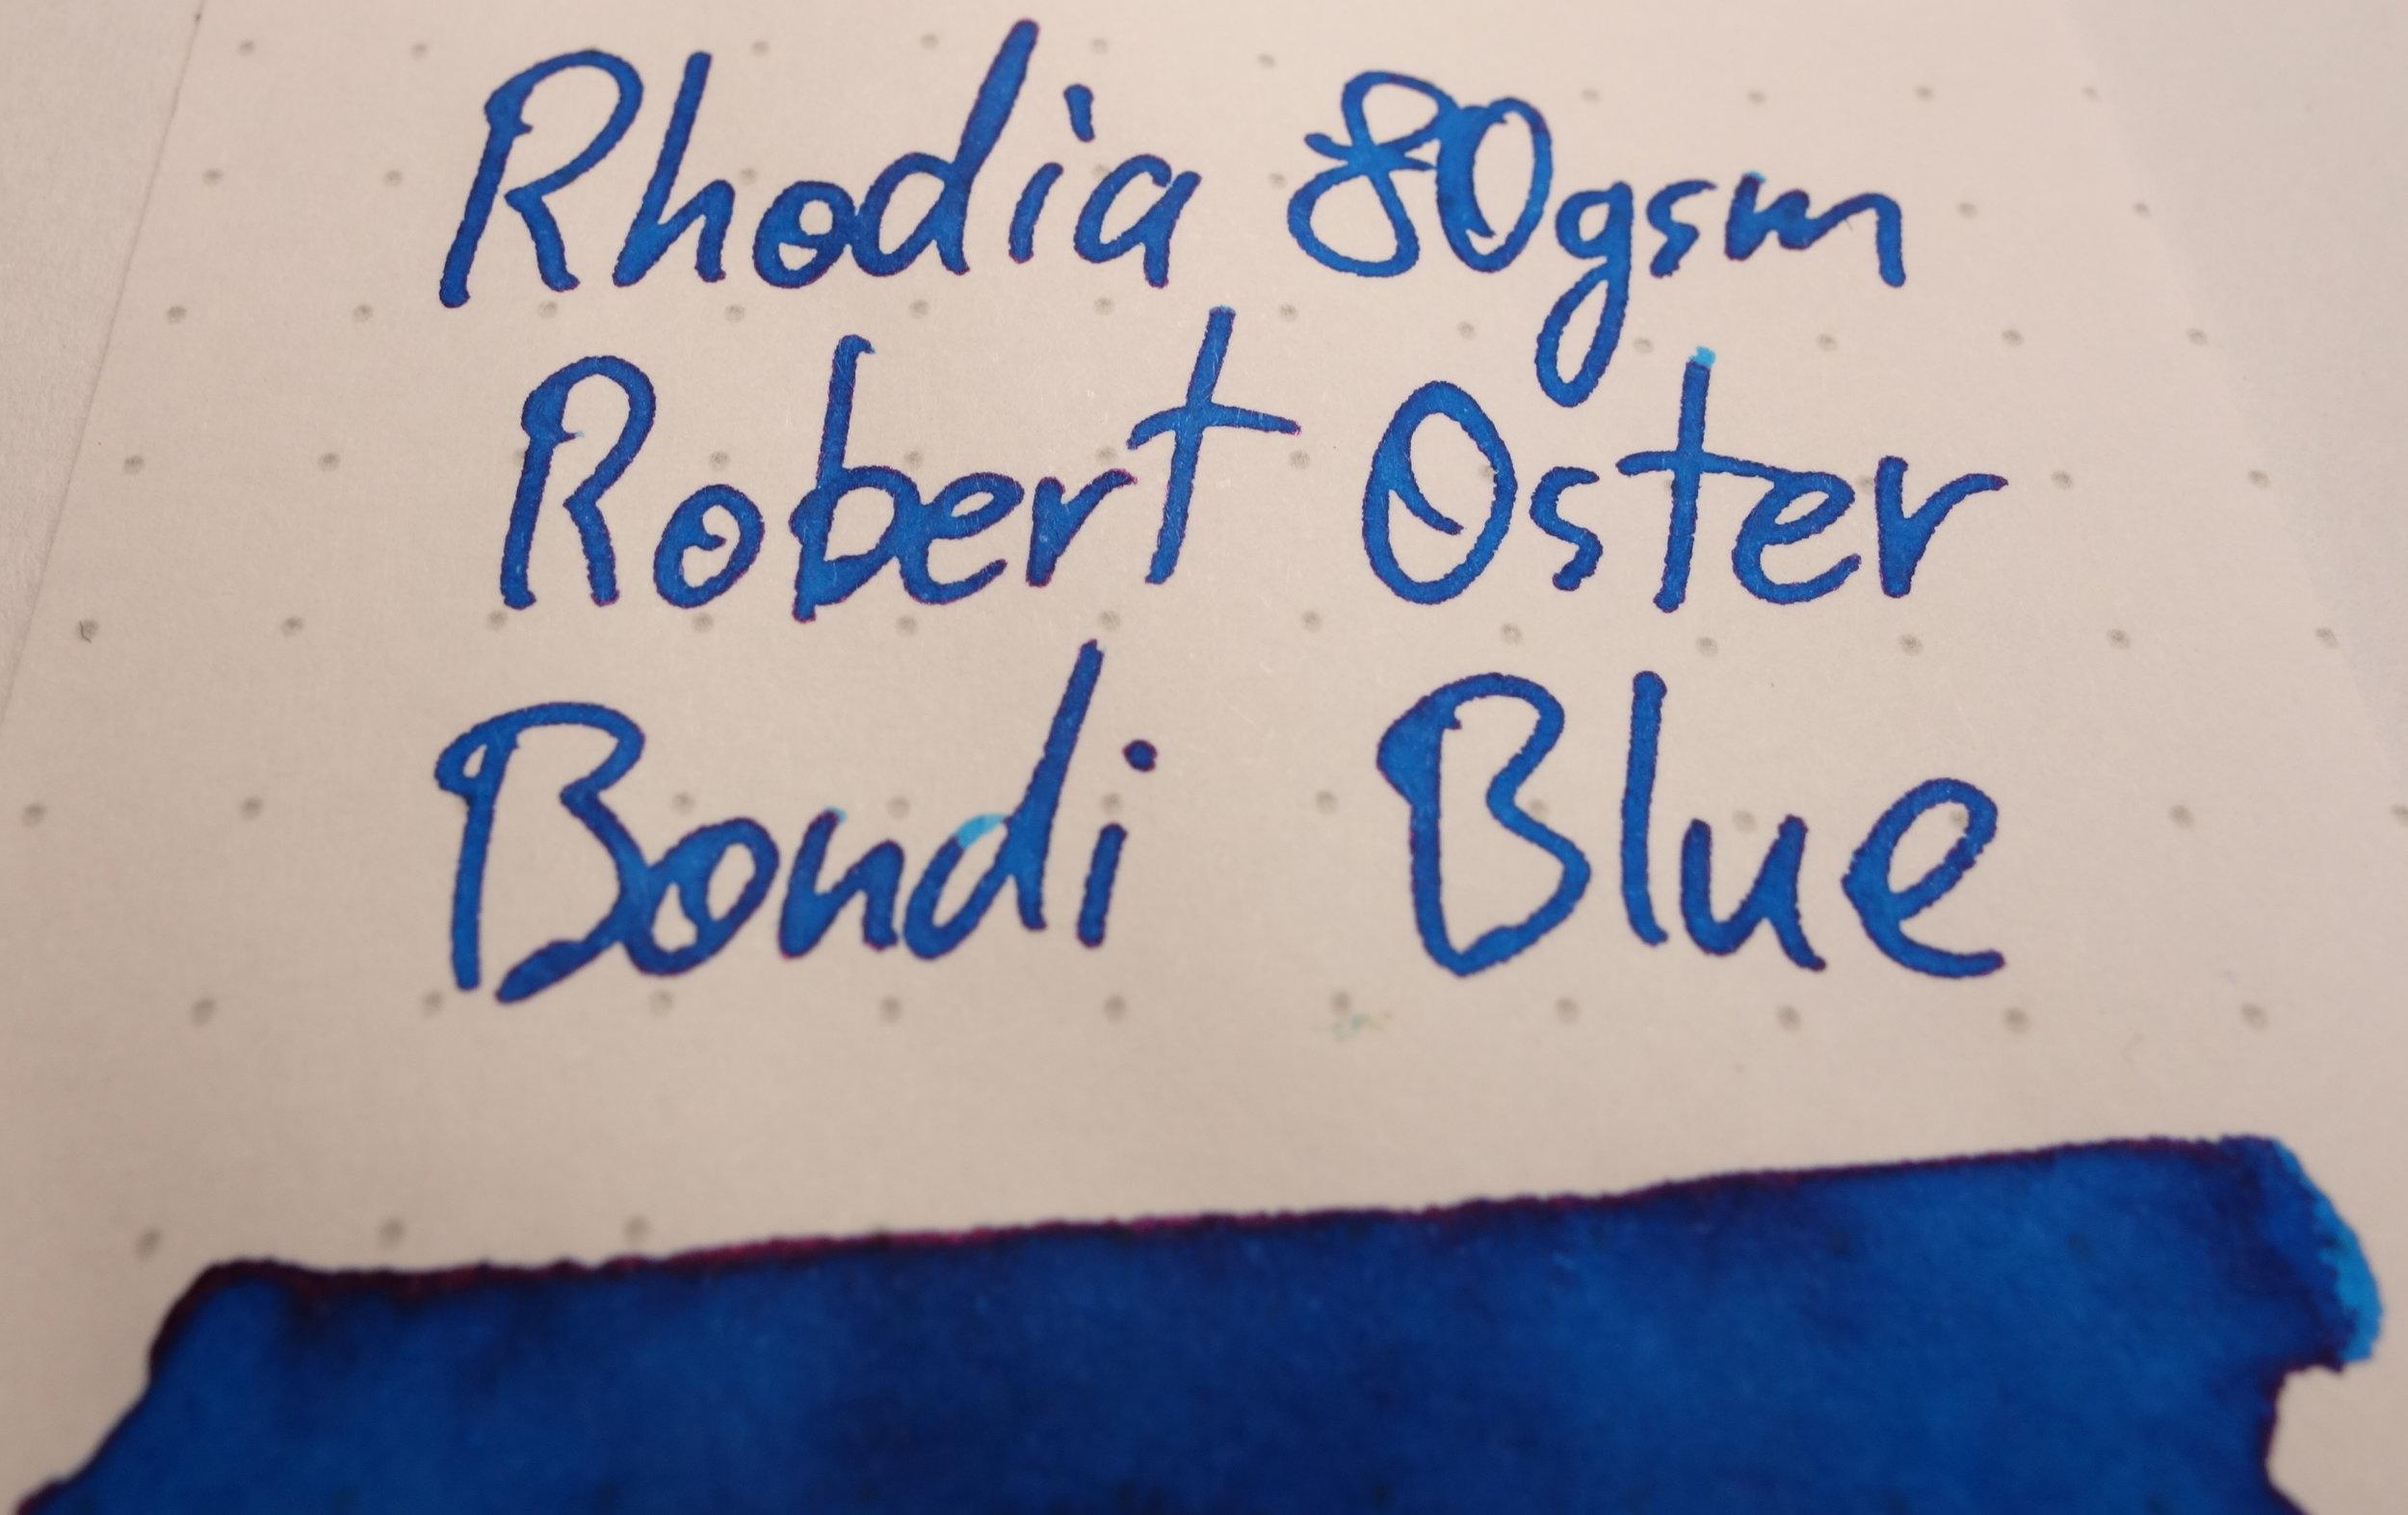 Robert Oster Bondi Blue Sheen Rhodia.JPG